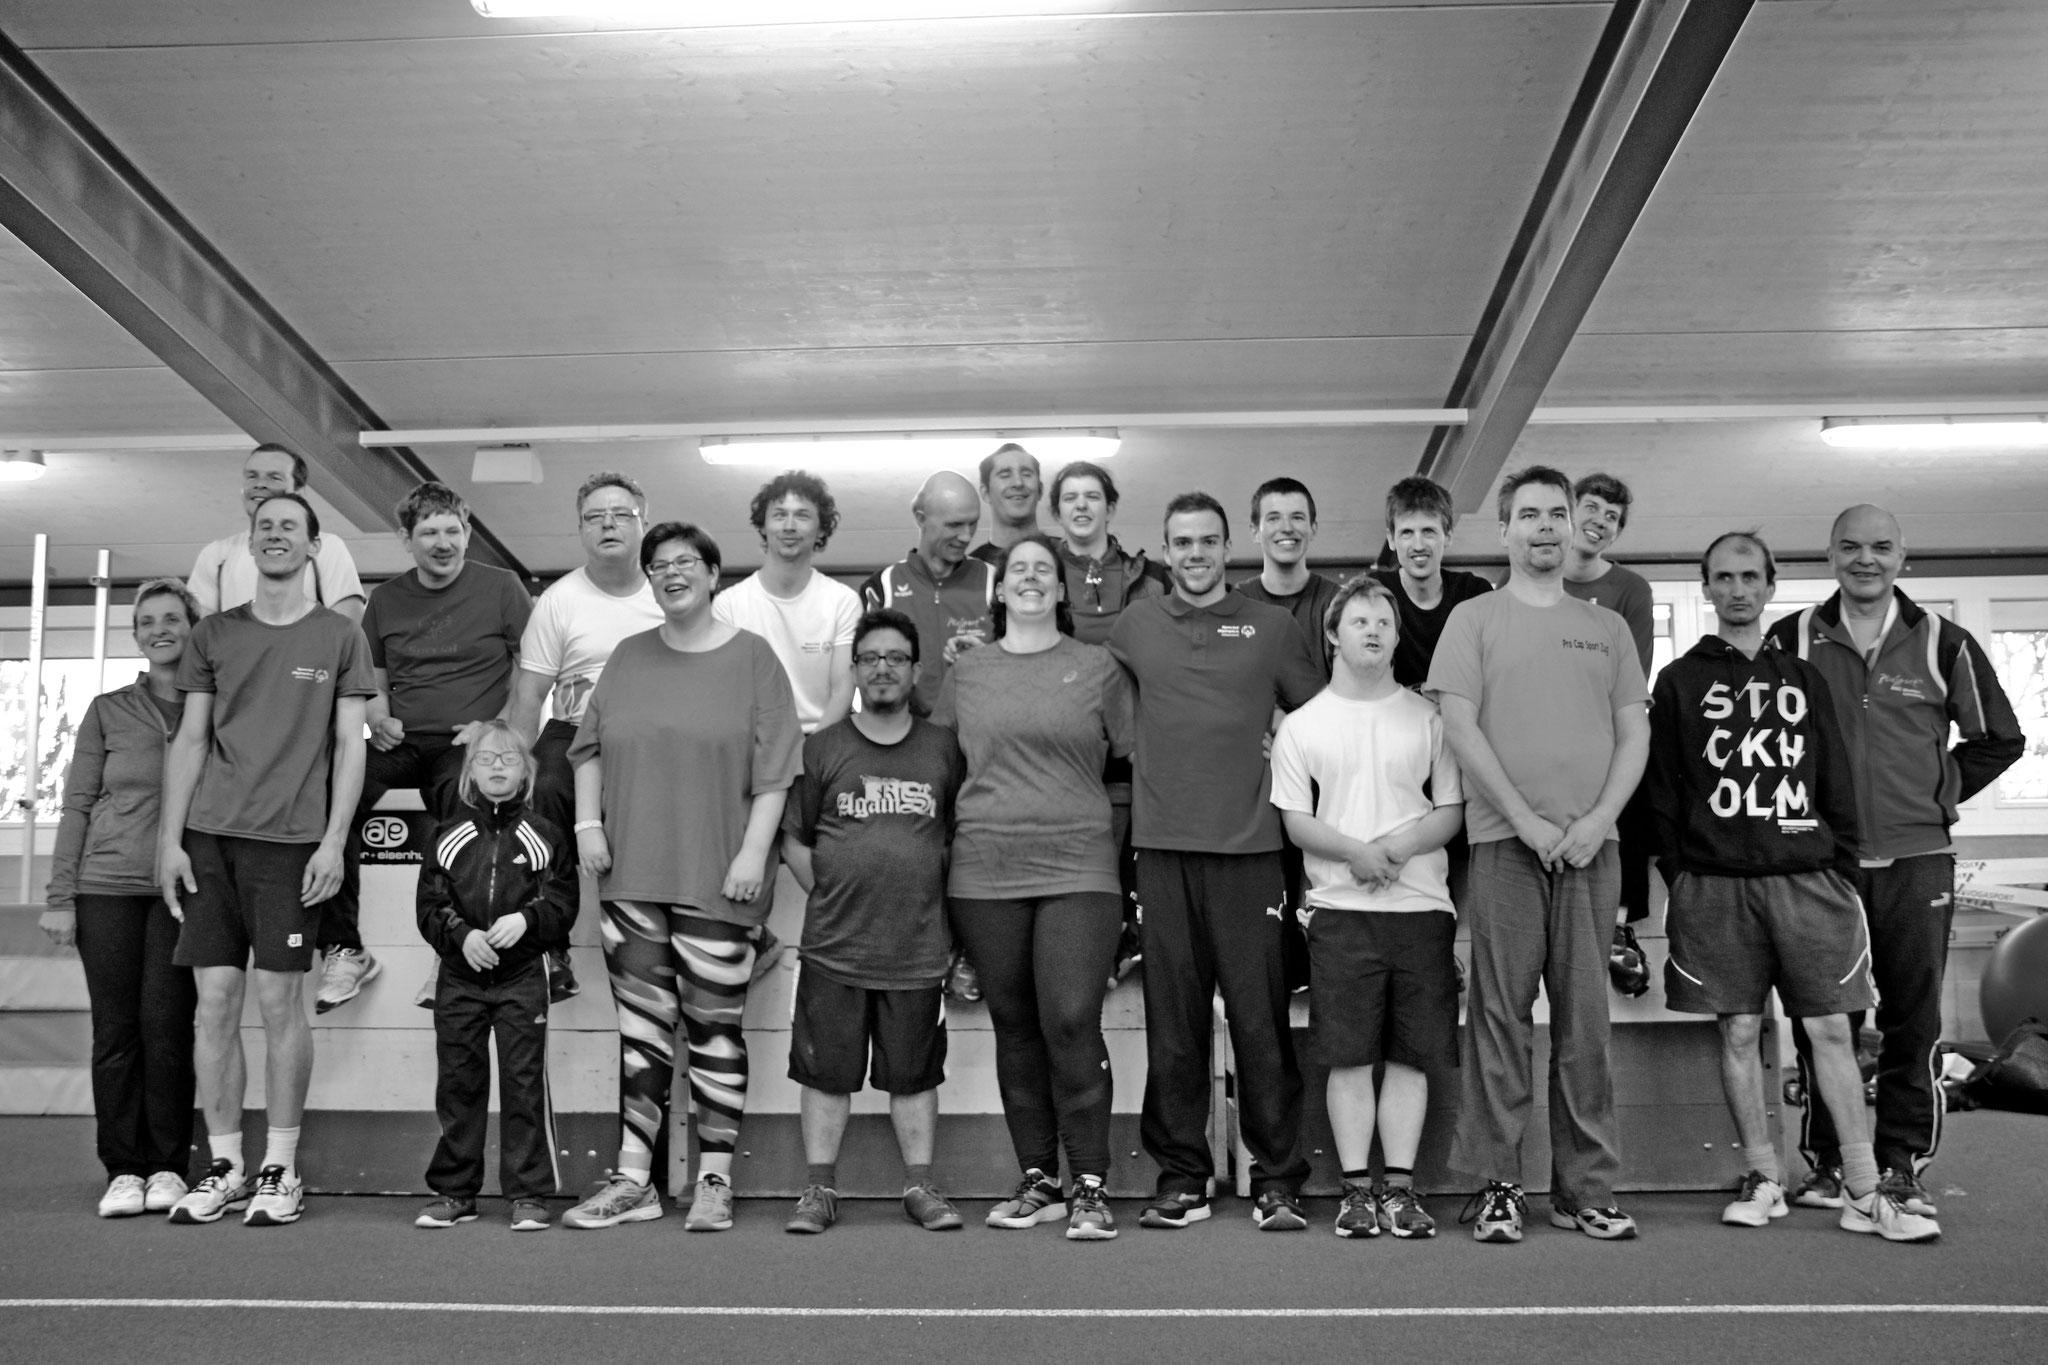 Leichtathletik Team Wohlen Special Olympics